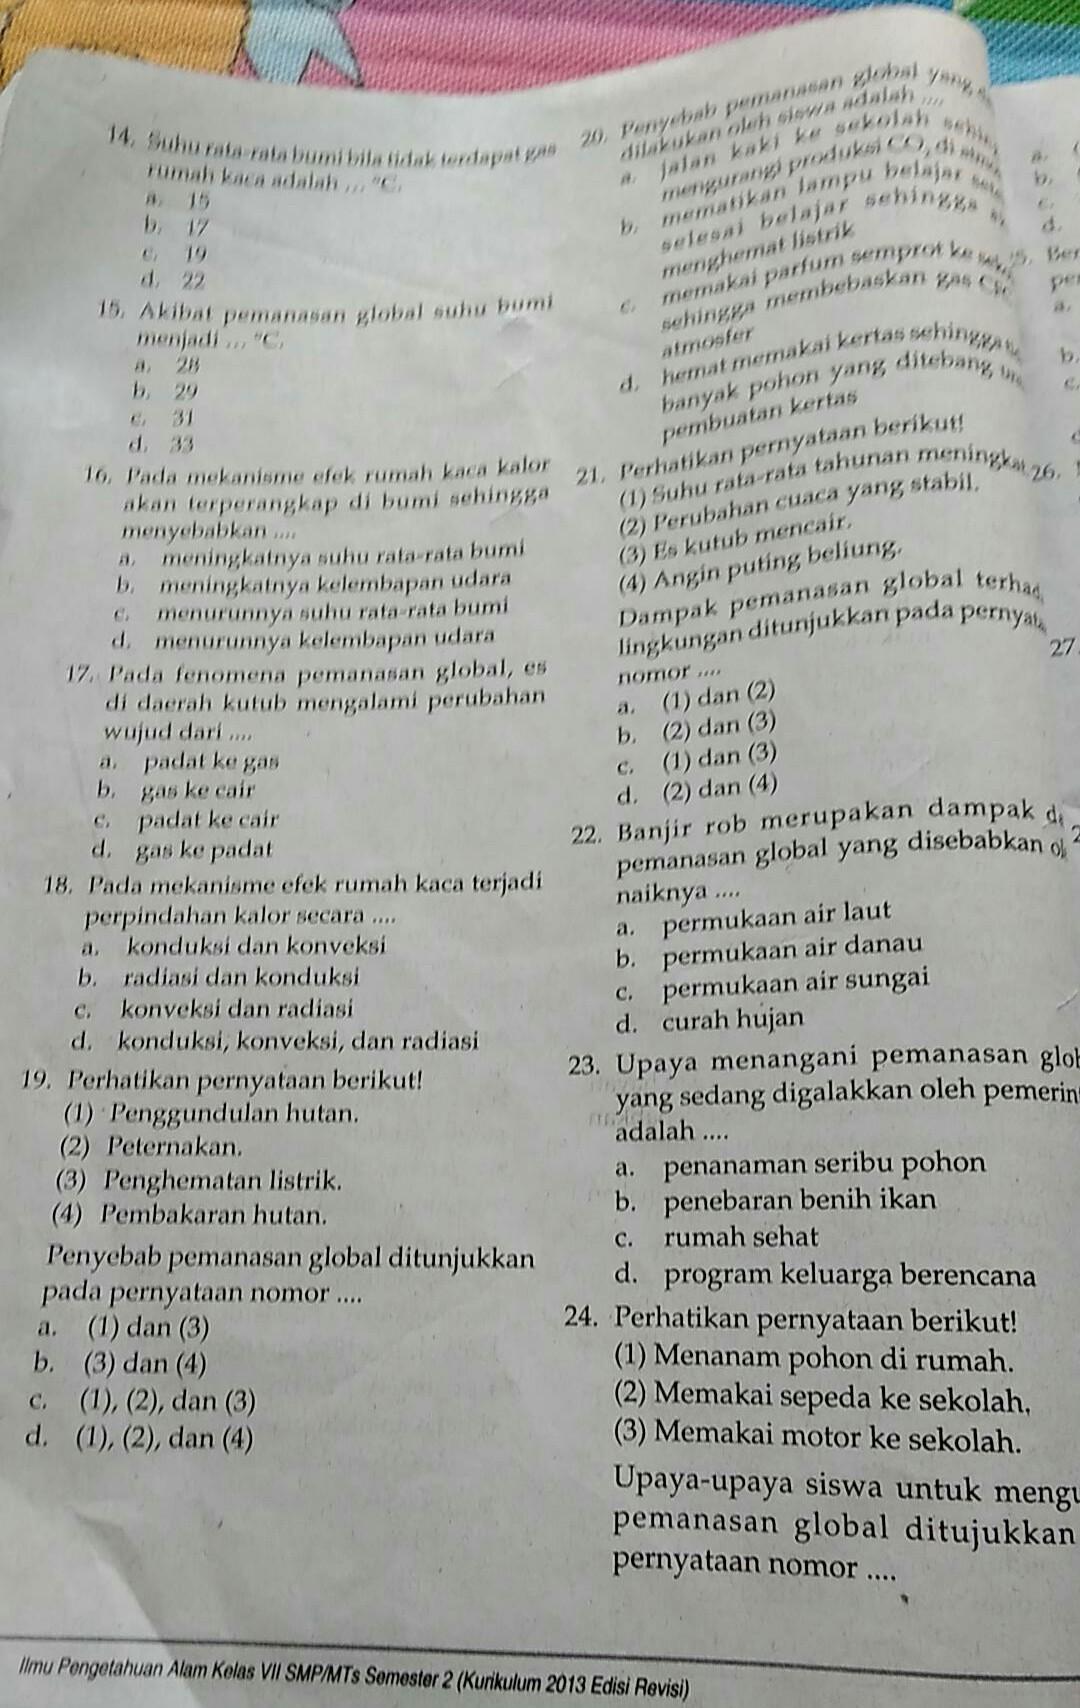 tolong jawab no 14 sampai 23 - Brainly co id